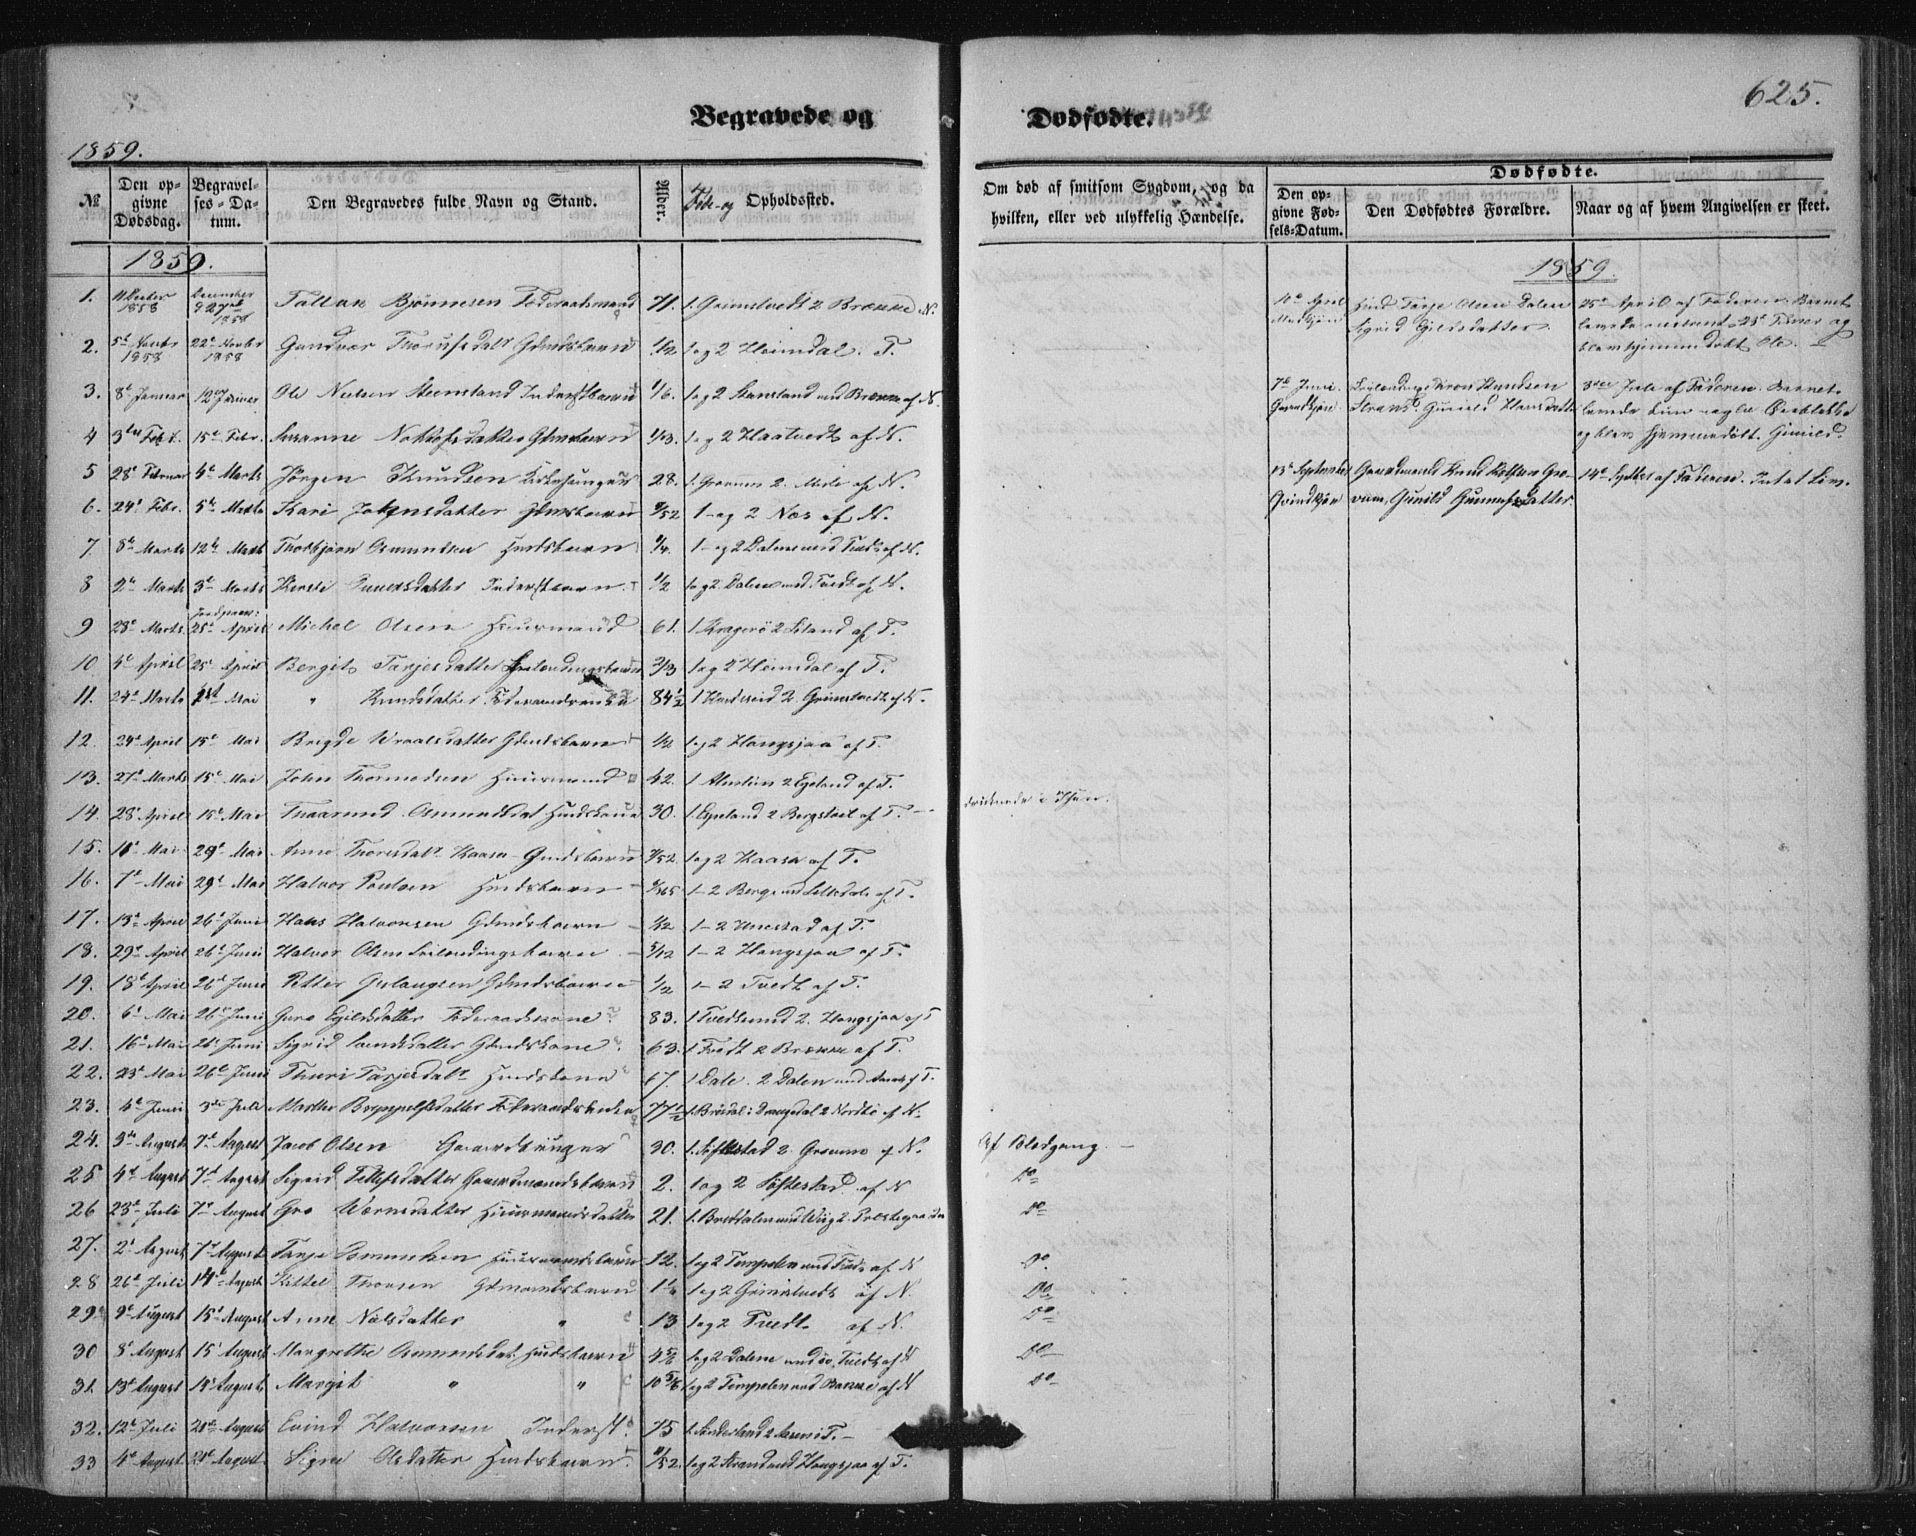 SAKO, Nissedal kirkebøker, F/Fa/L0003: Ministerialbok nr. I 3, 1846-1870, s. 624-625